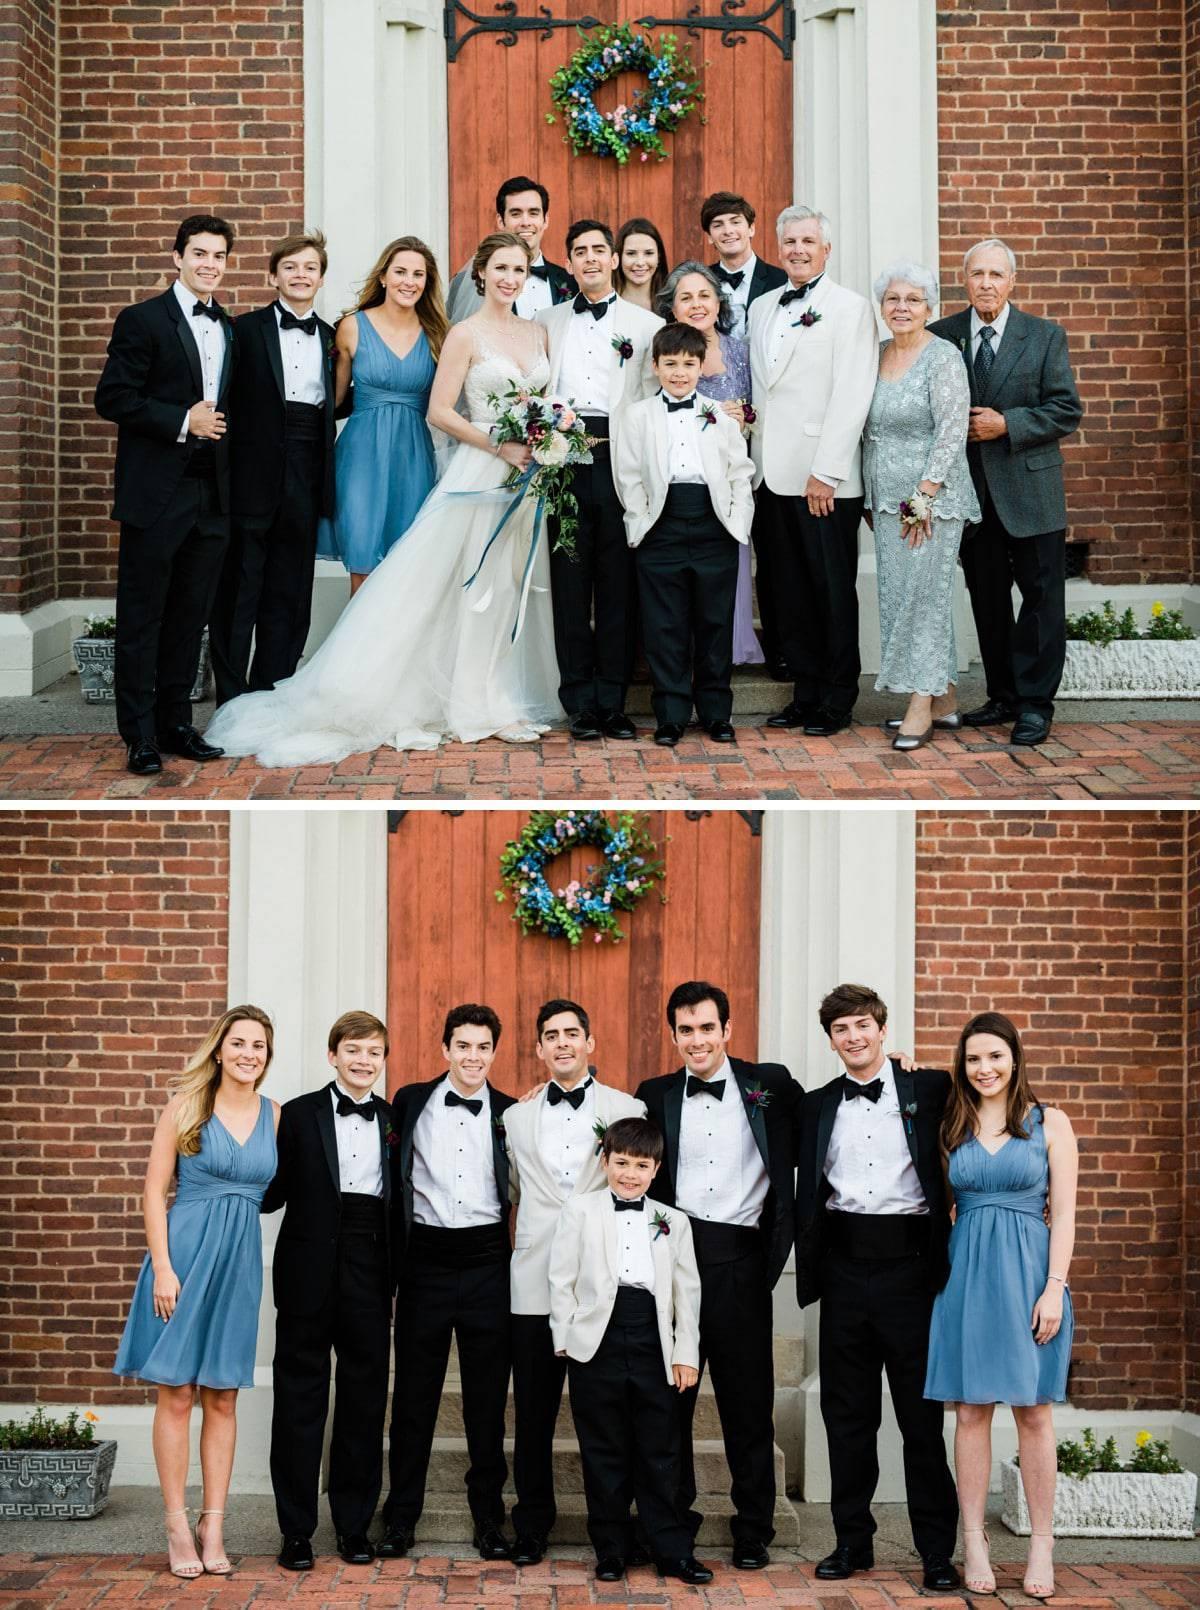 Church of the Assumption Wedding Photography in Nashville, TN